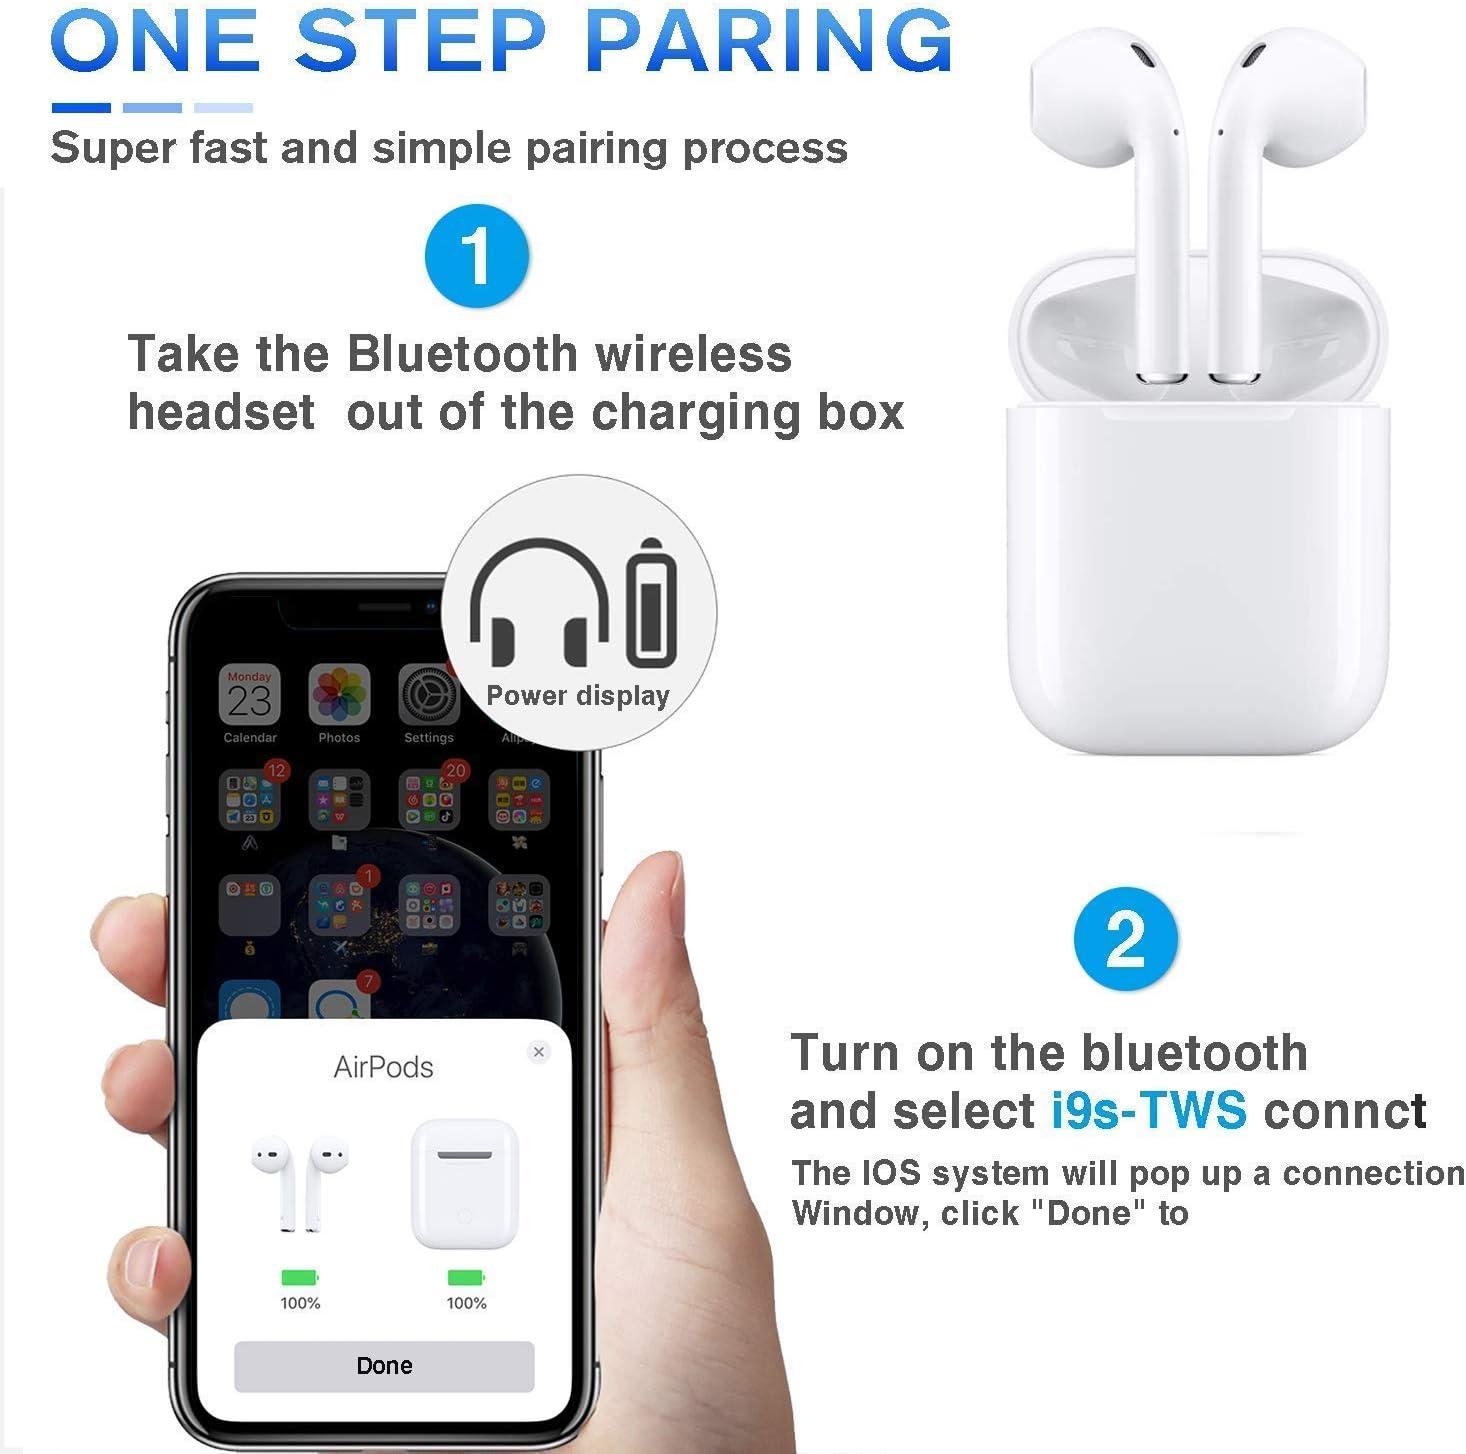 Bluetooth Kopfh/örer 5.0 Noise Cancelling Drahtloses In-Ear Bluetooth Headset 3D Stereo IPX7 Wasserdicht Automatische Kopplung Schnellladung f/ür Apple//AirPods//AirPods Pro//Android//iPhone